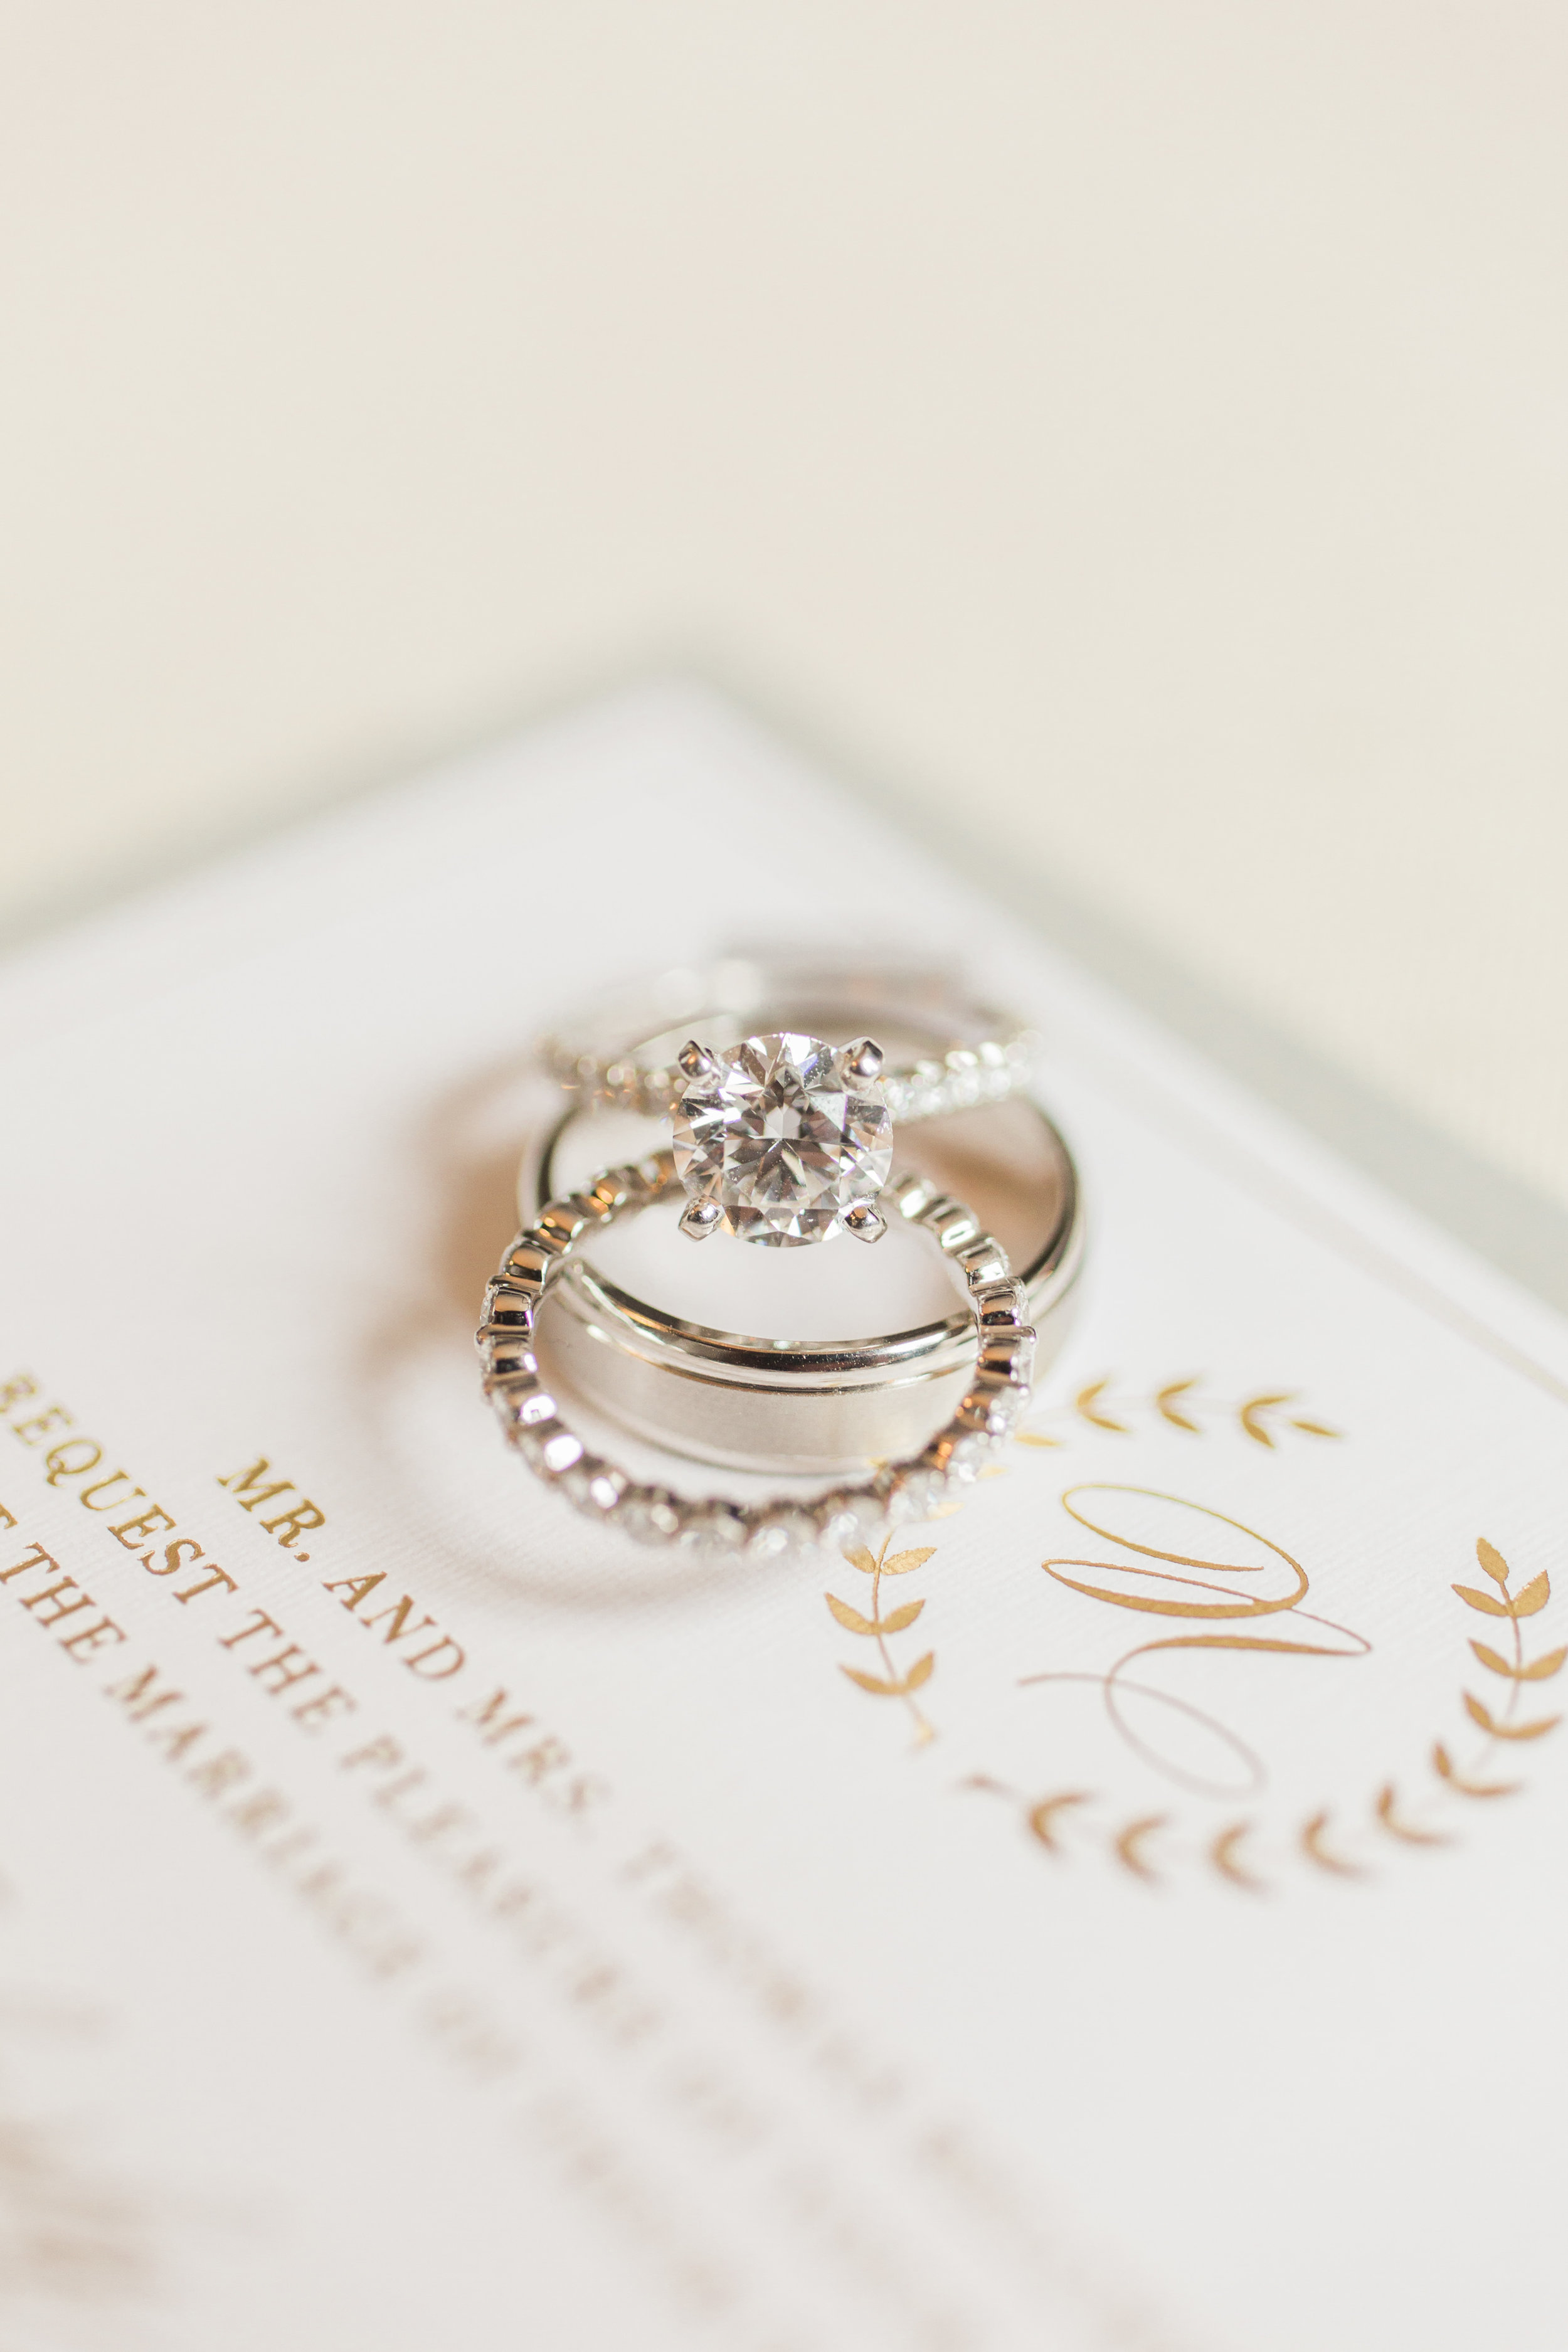 Hudson-Nichols-Black-Tie-Bride-Philadelphia-Waterworks-Wedding-Pave-Diamond-Engagement-Ring03.jpg